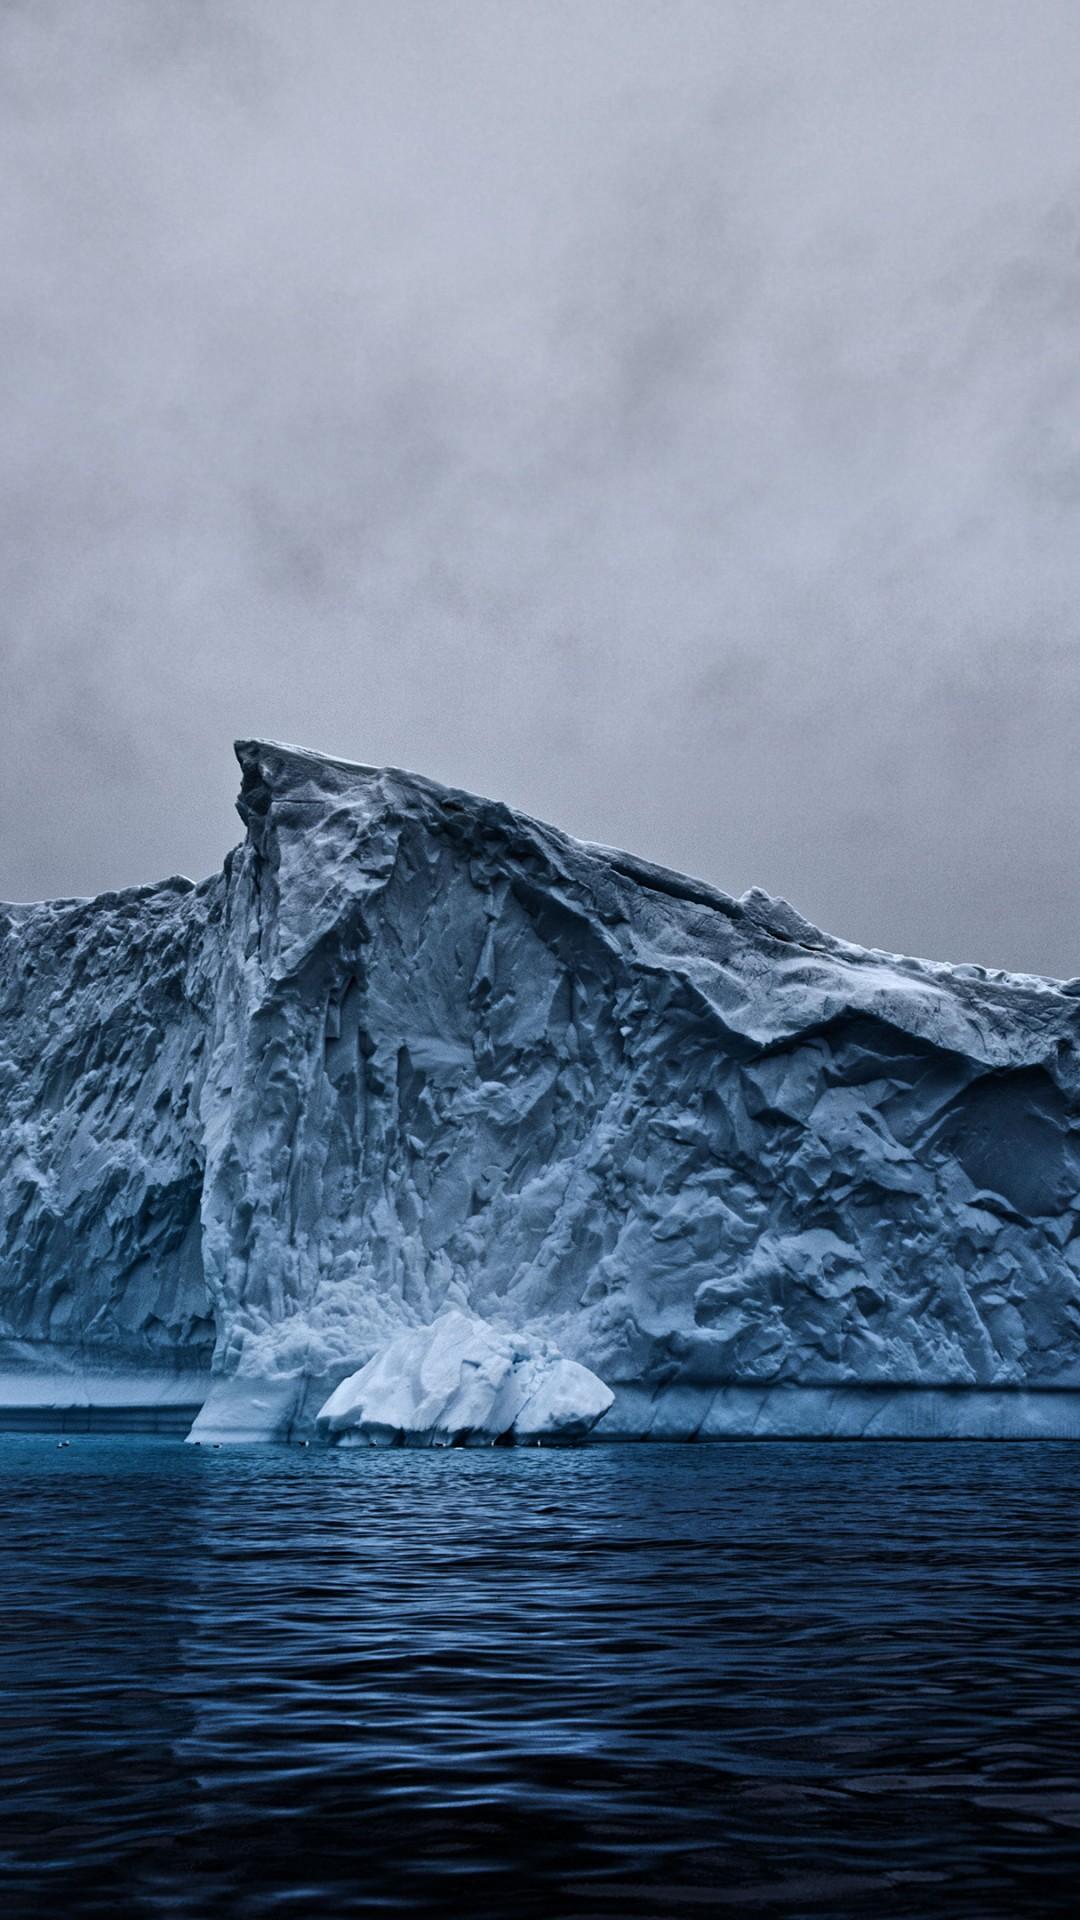 Food Wallpaper Hd Wallpaper Antarctica Iceberg Ocean 4k Travel 16235